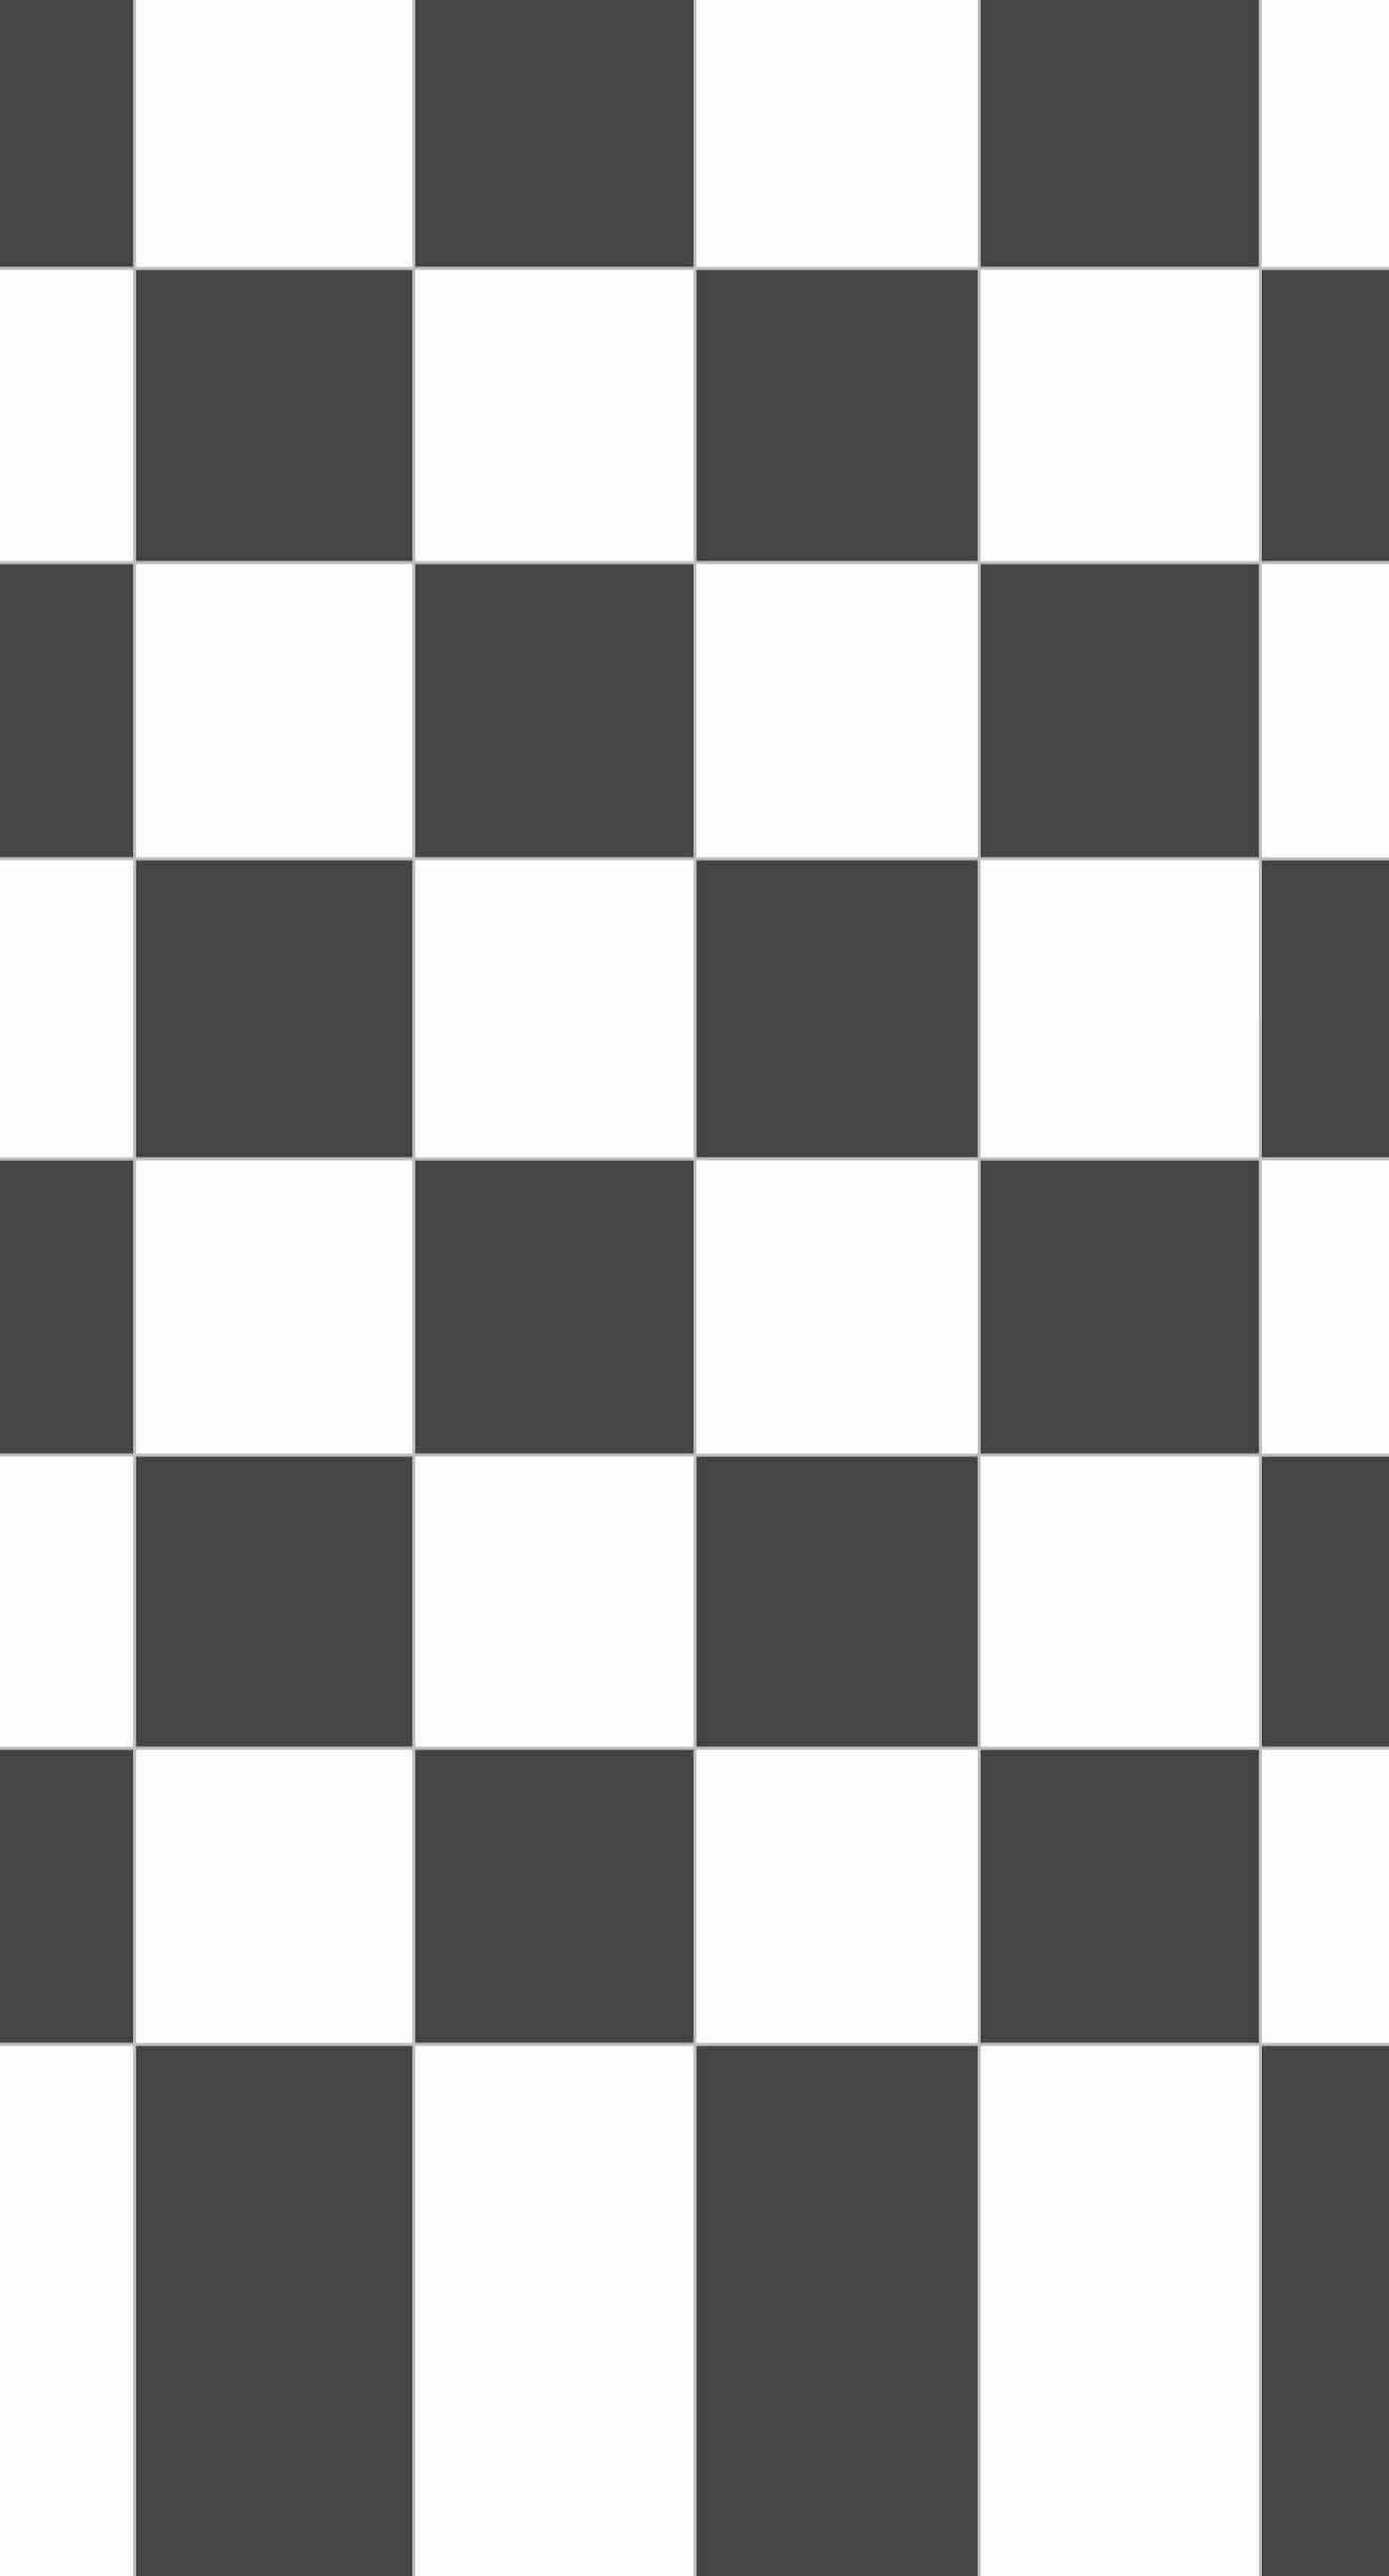 Black And White Checkered Shelf Wallpaper Sc Iphone8plus